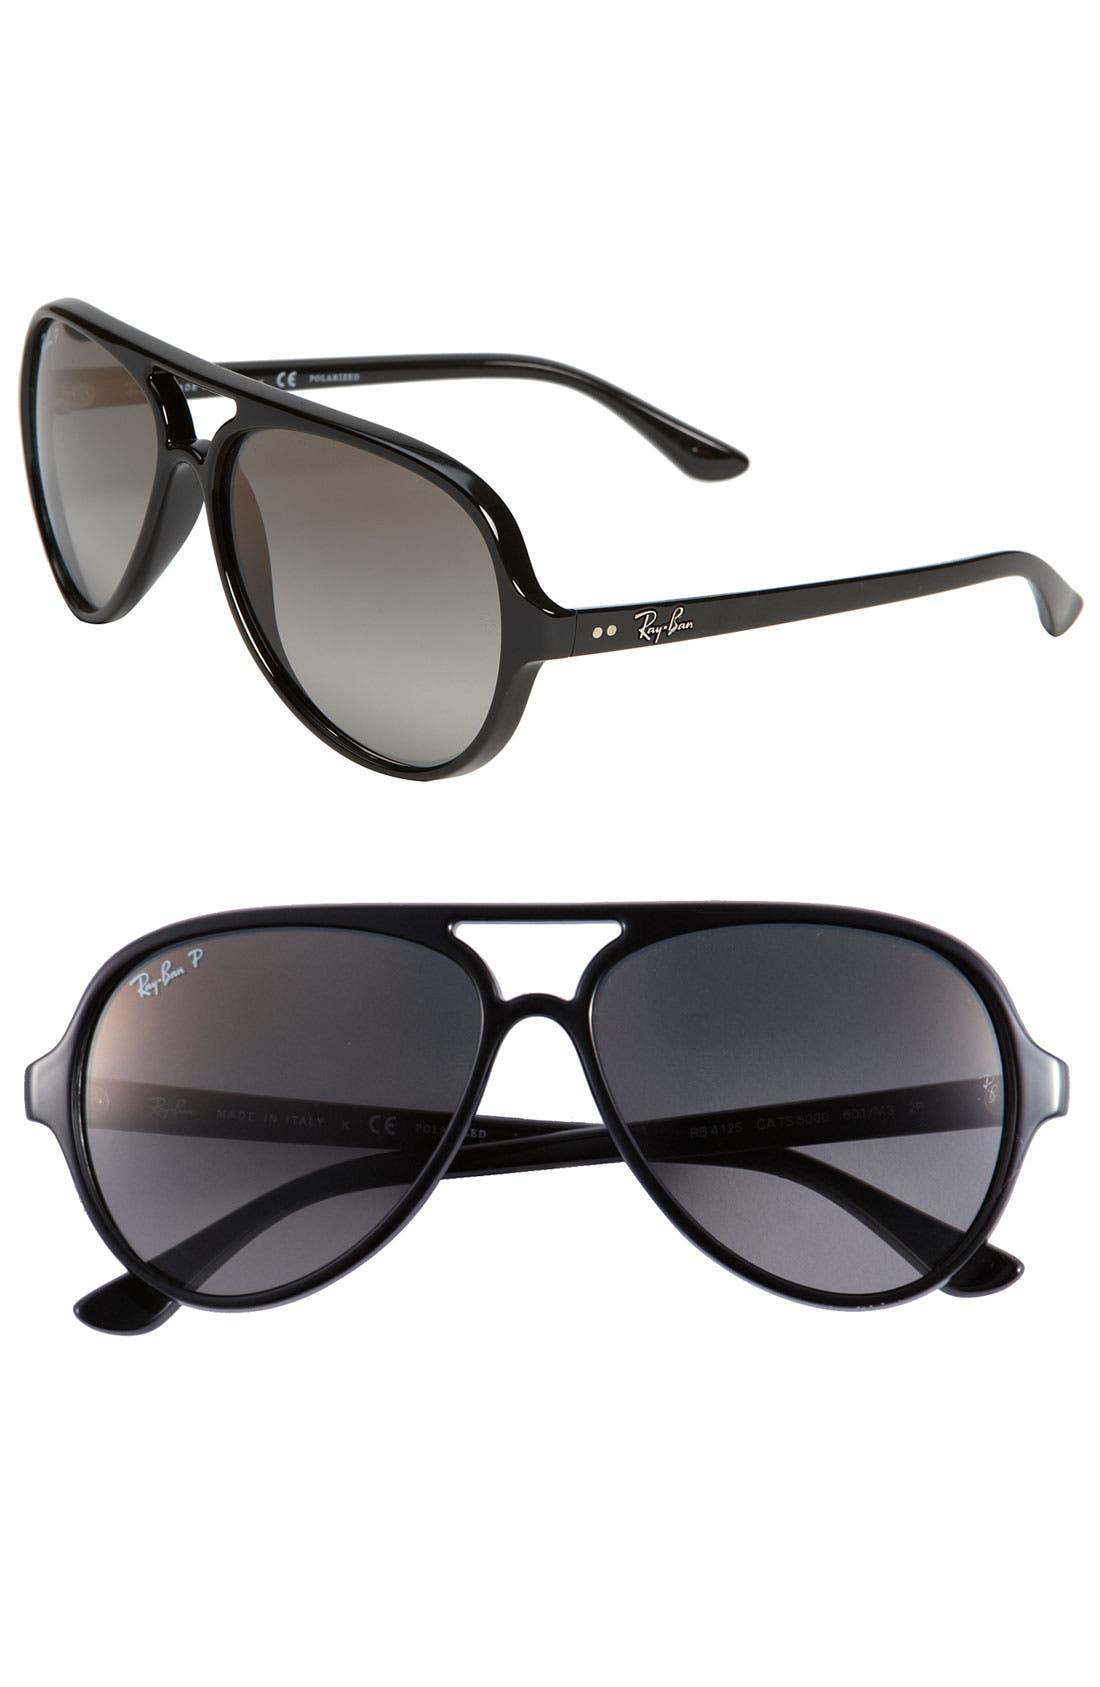 Alternate Image 1 Selected - Ray-Ban Polarized Aviator Sunglasses